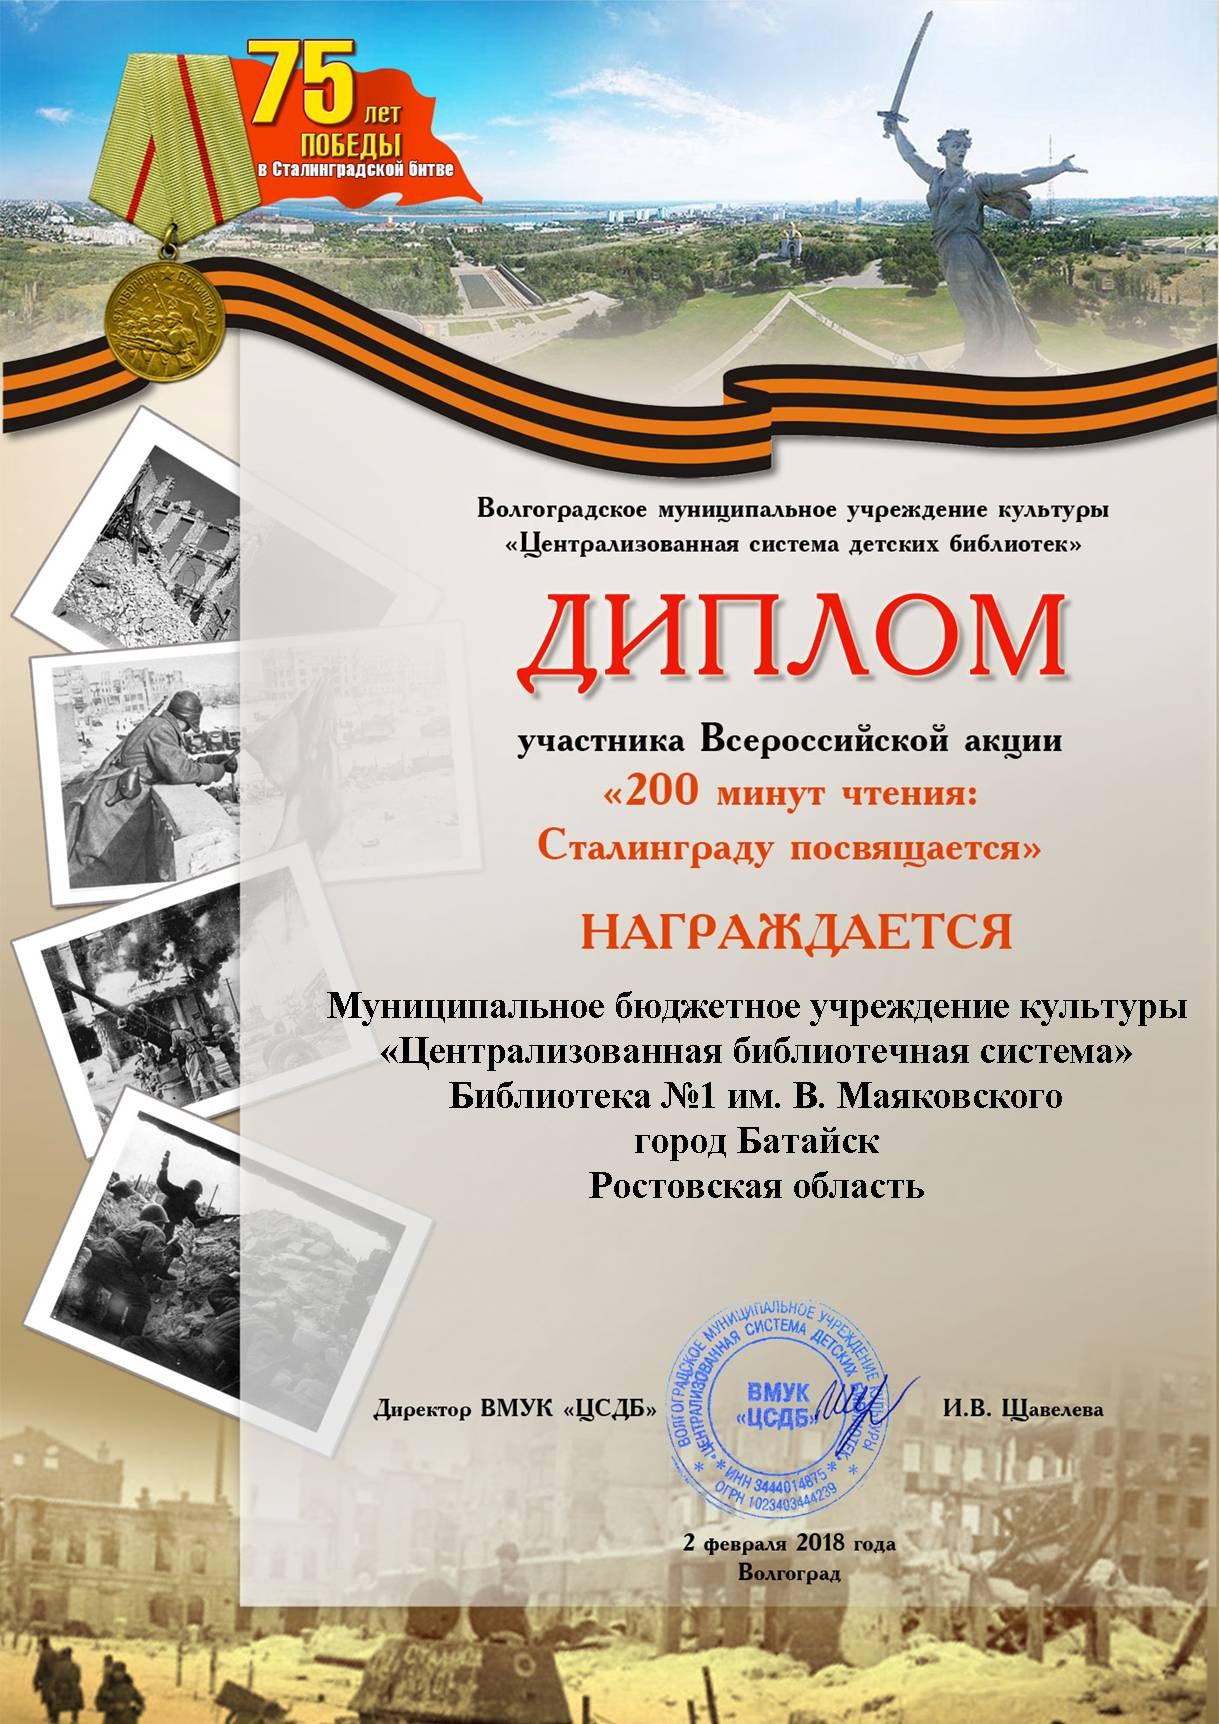 Б-ка № 1 Диплом 75 лет Сталинград Б1